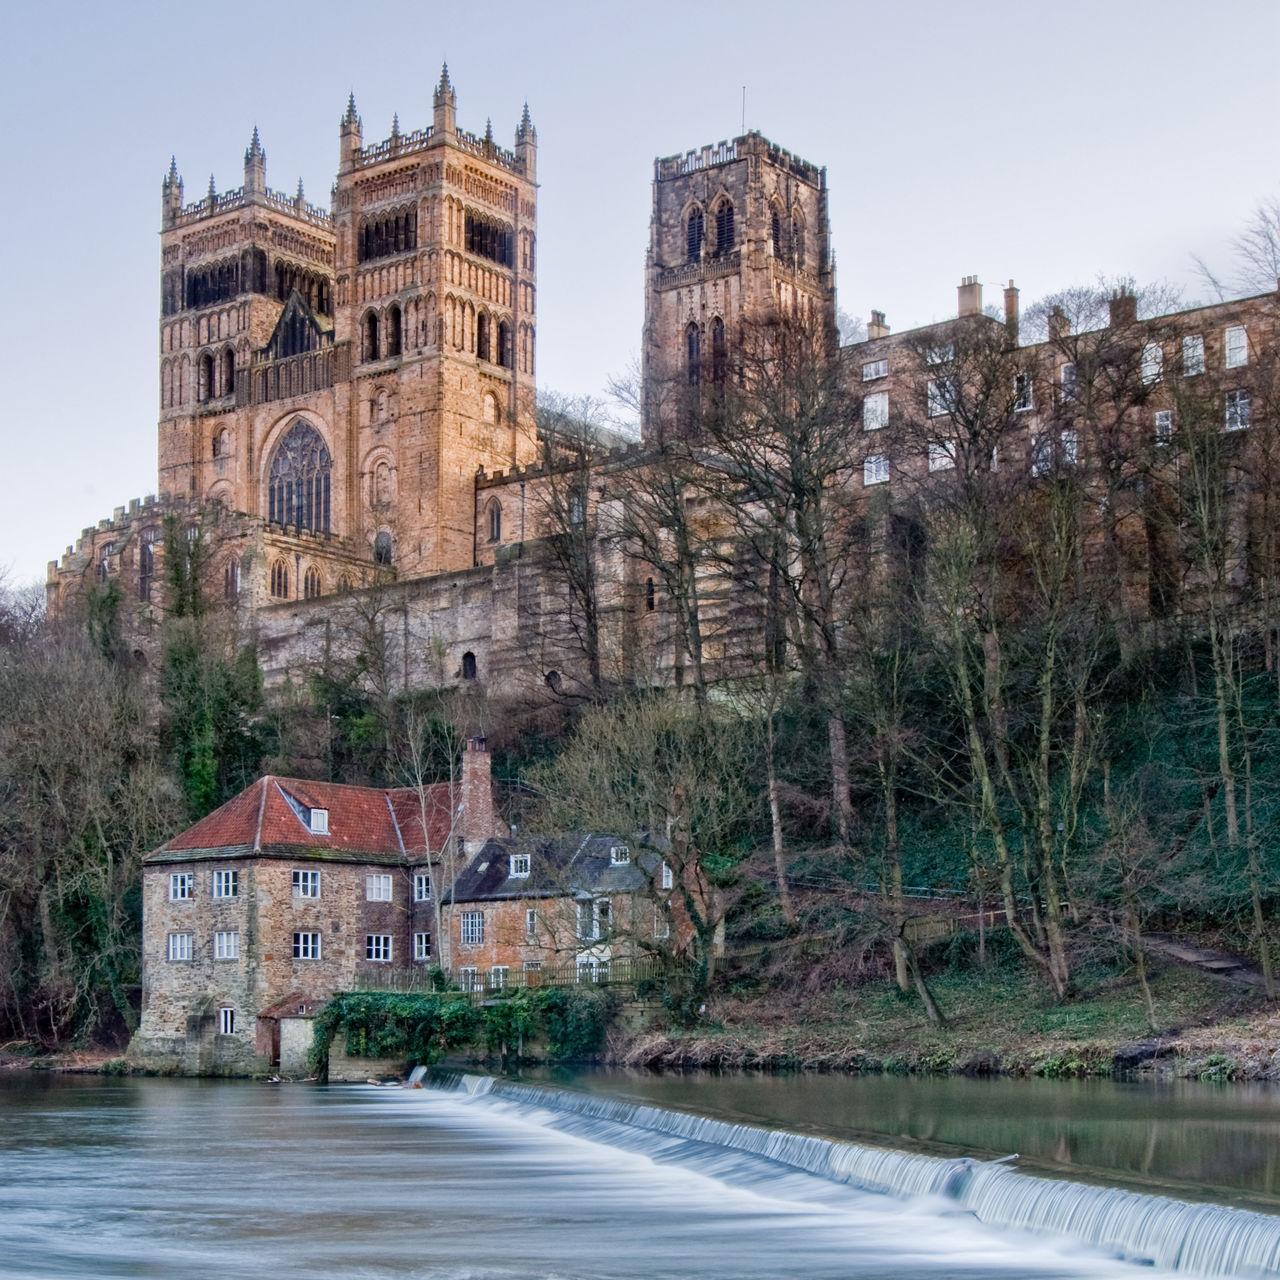 Durham City Durham Wear River River View Watermill Durham Cathedral DurhamCathedral